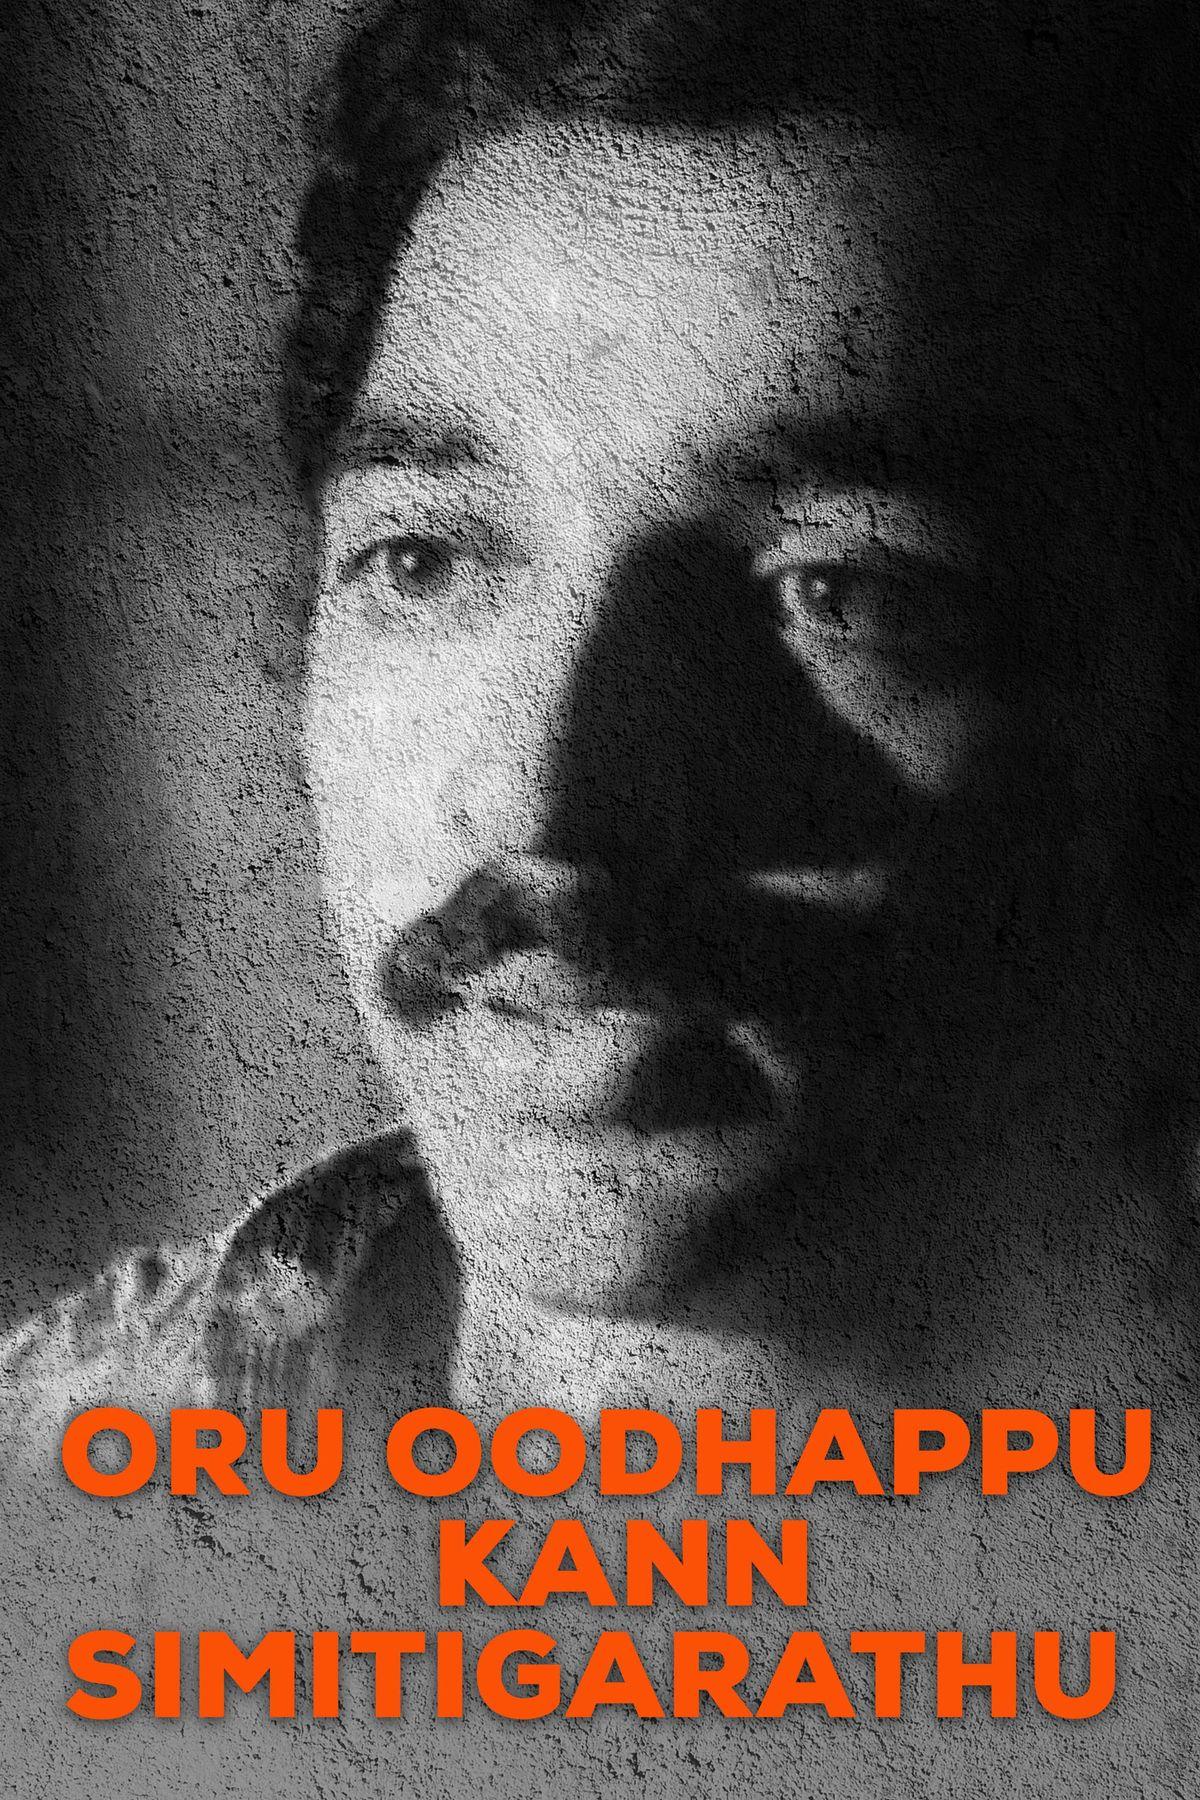 Oru Oodhappu Kann Simittukiradhu